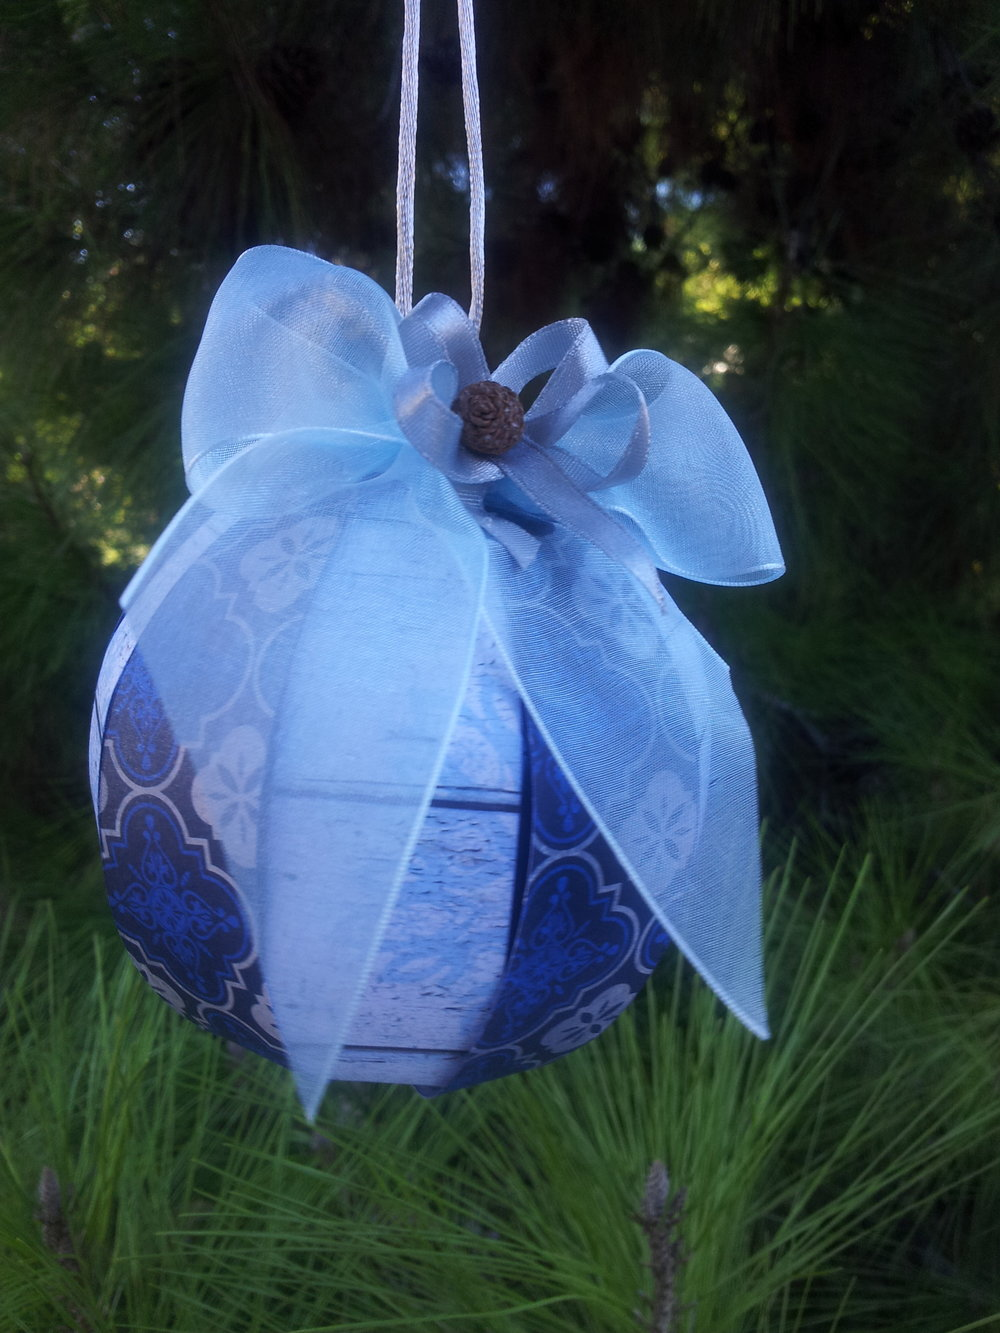 5. Large Bauble Ornament